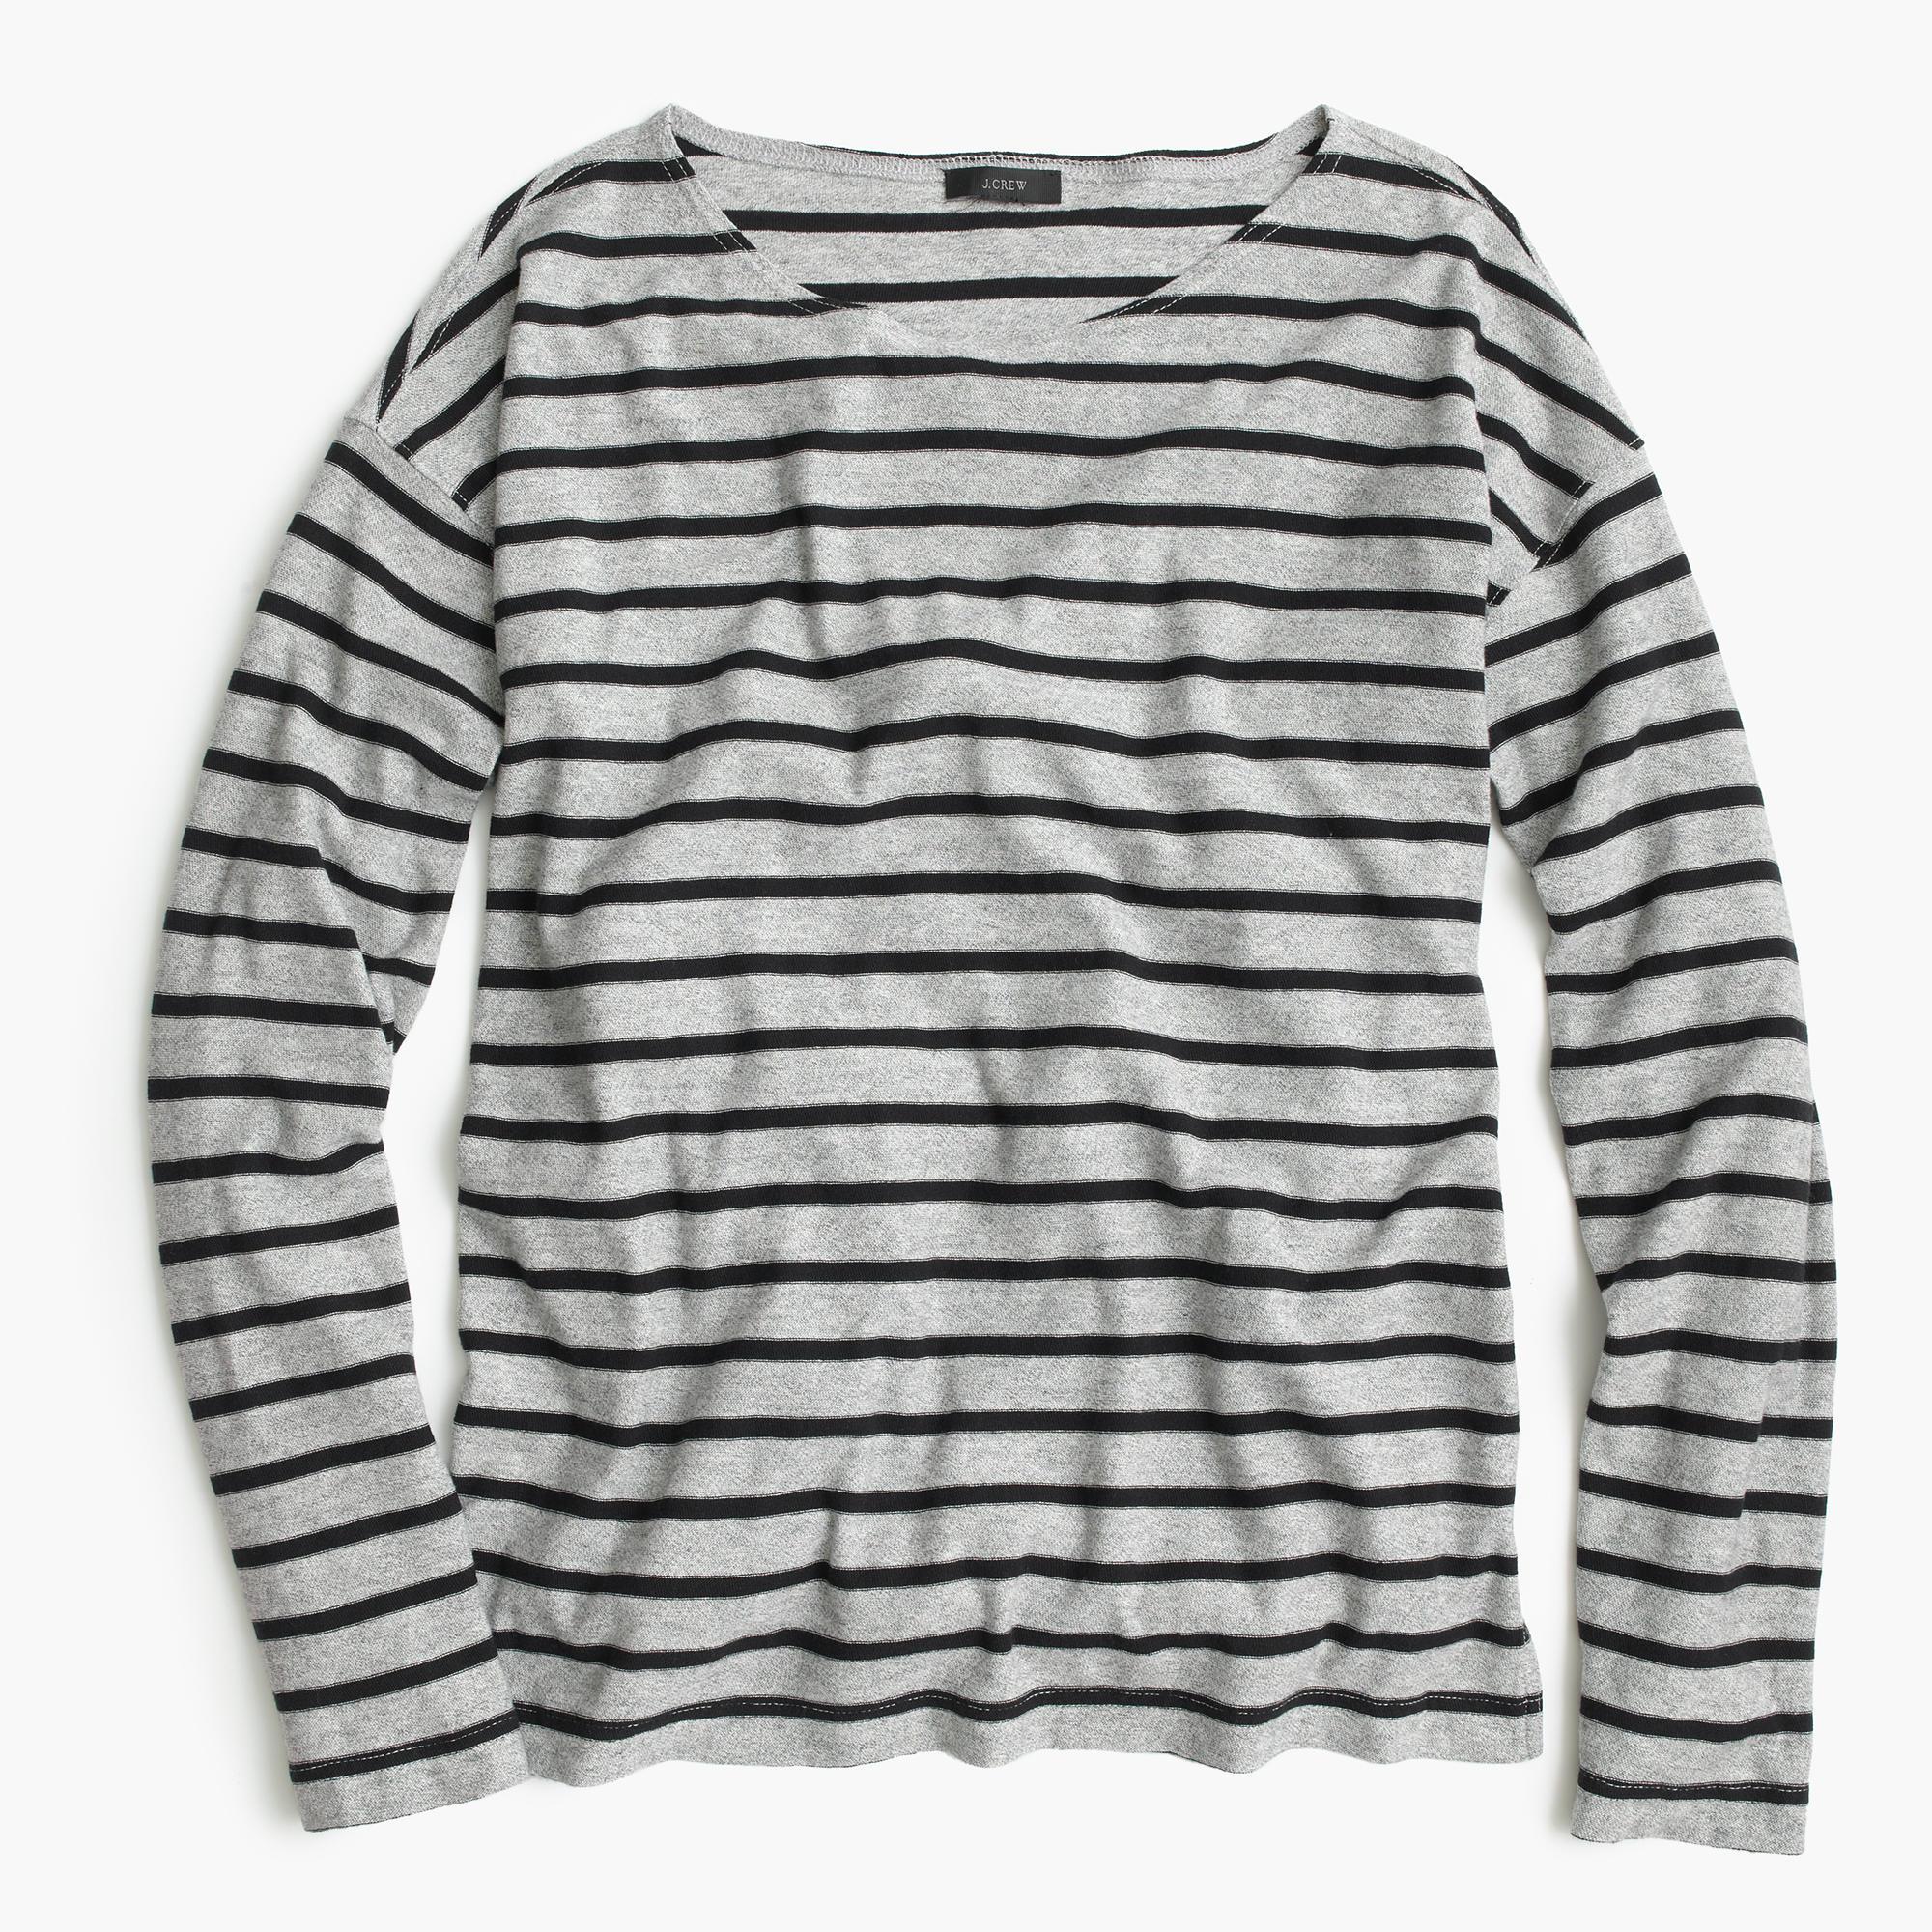 Deck striped t shirt in gray lyst Grey striped t shirt